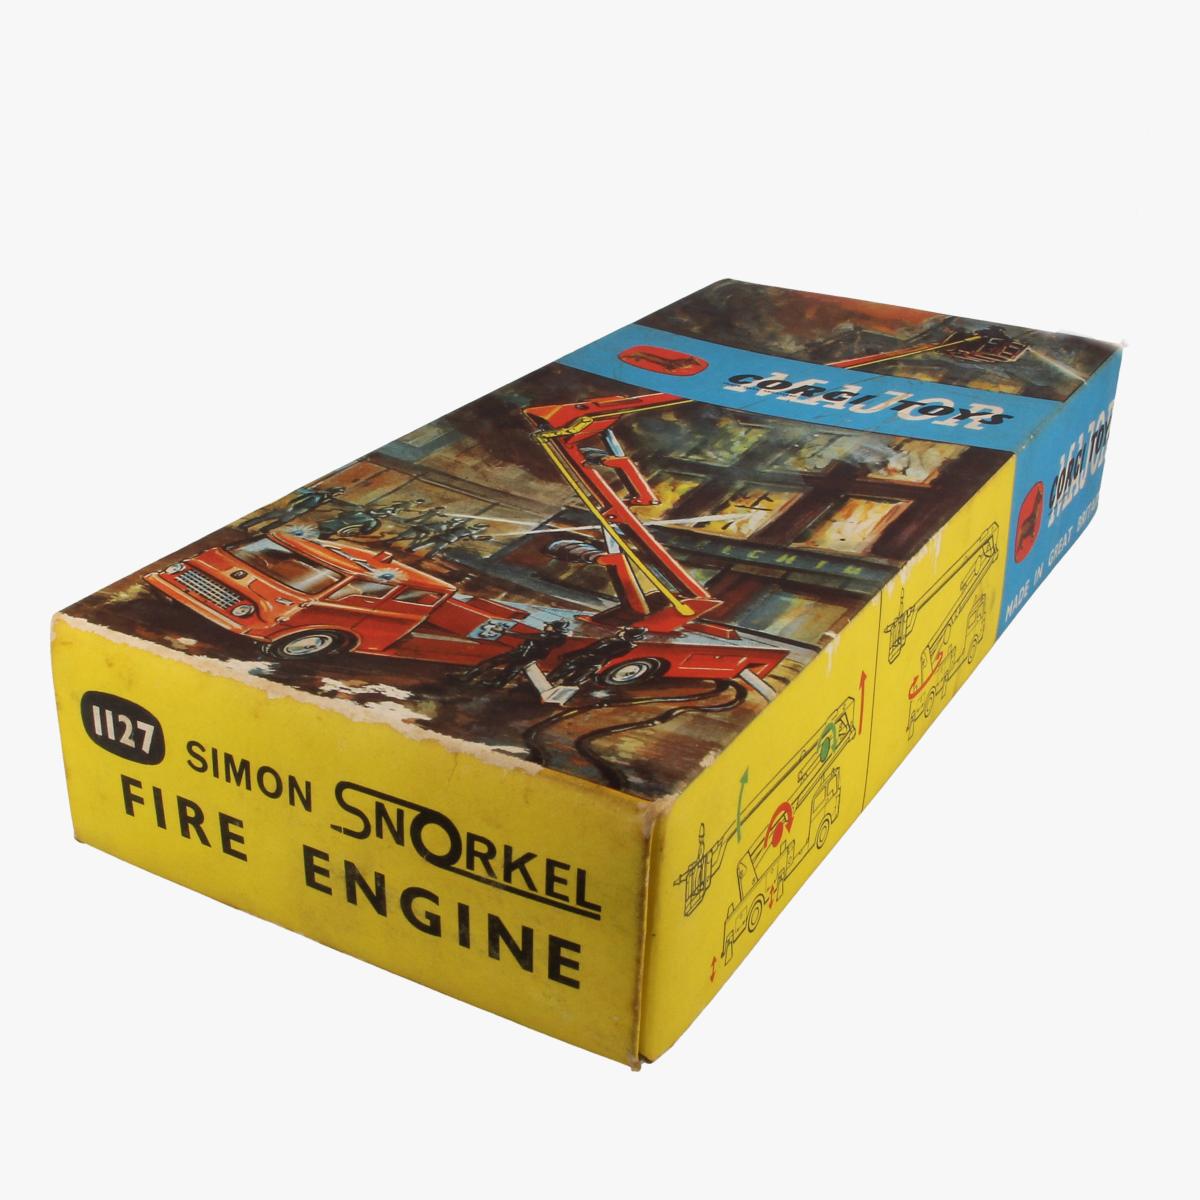 Afbeeldingen van Corgi Toys. Simon Snorkel Fire Engine. Nr. 1127